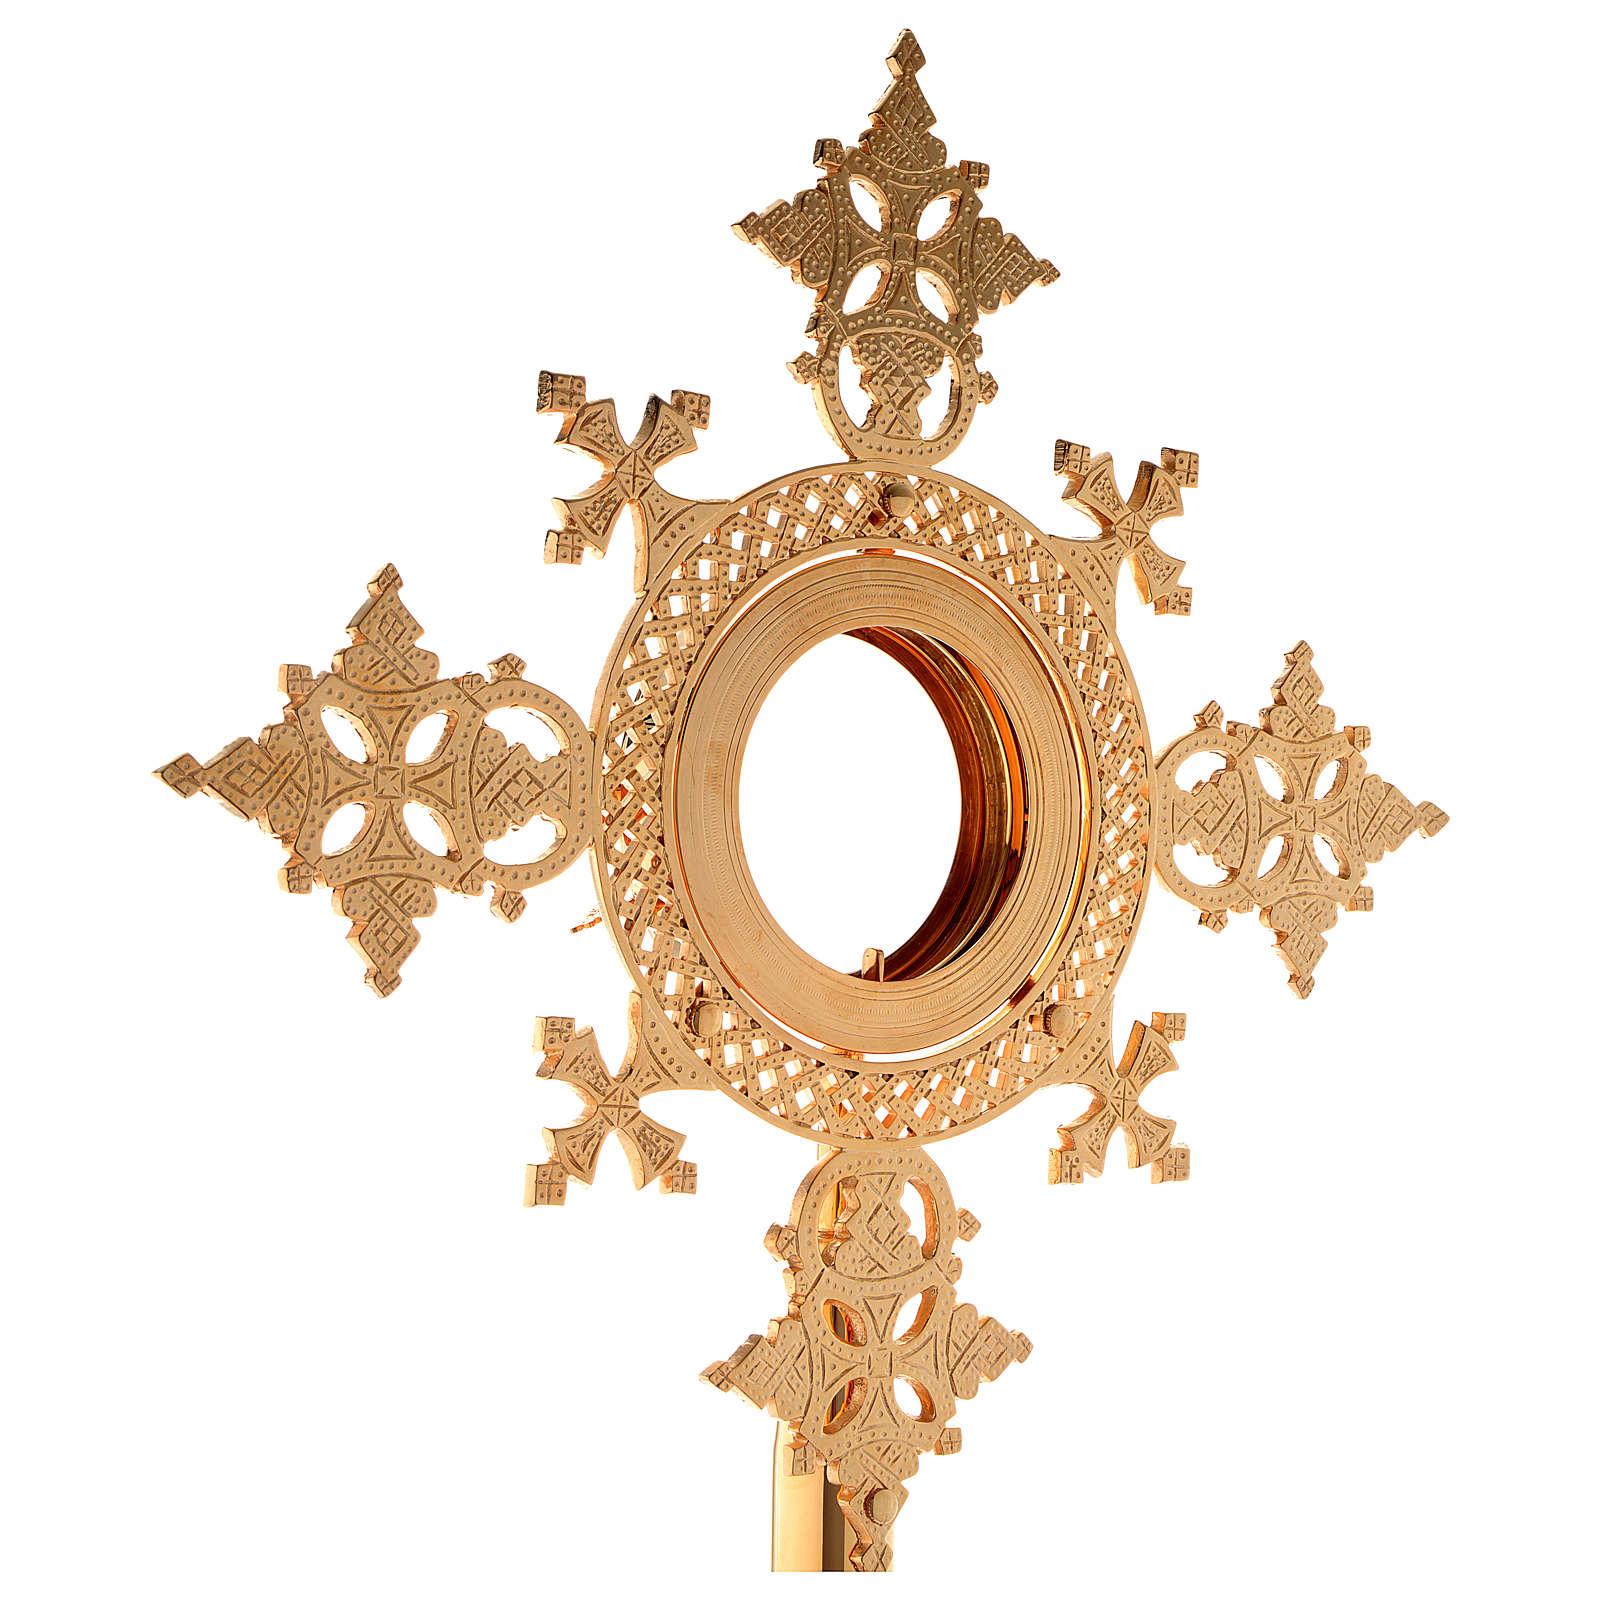 Ostensorio Monaci di Betlemme Arbre de Vie 75 cm 4